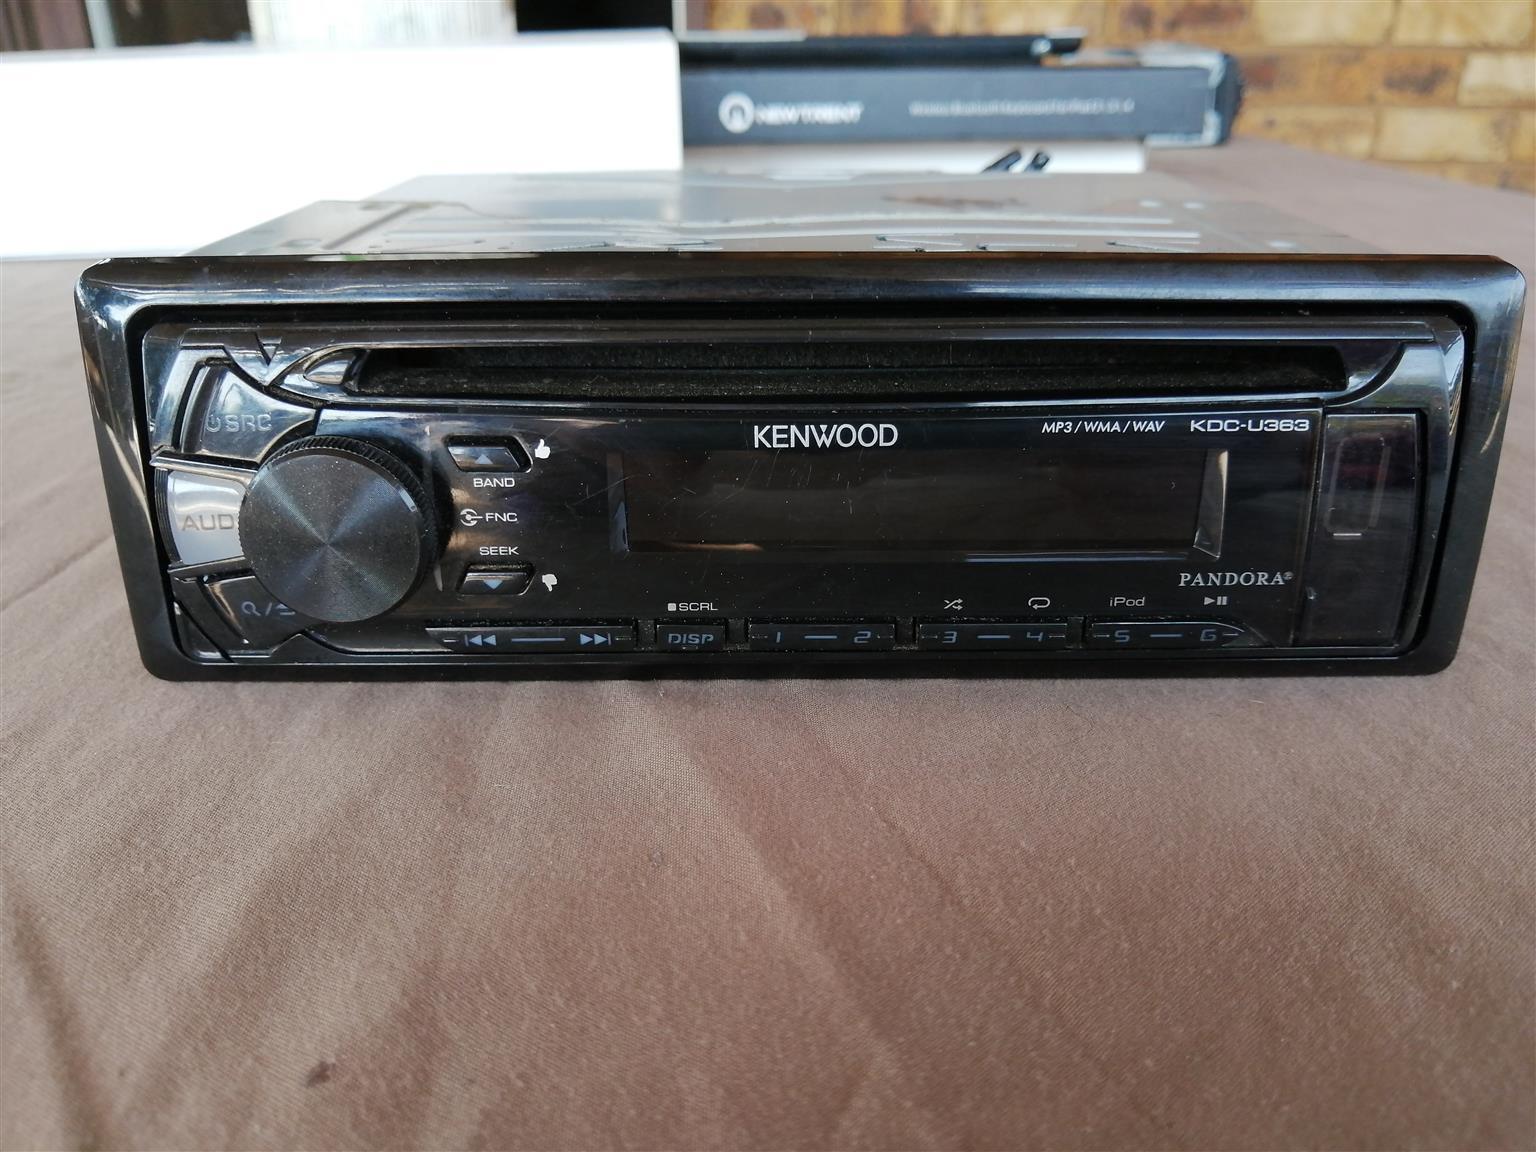 Kenwood kdc-u363